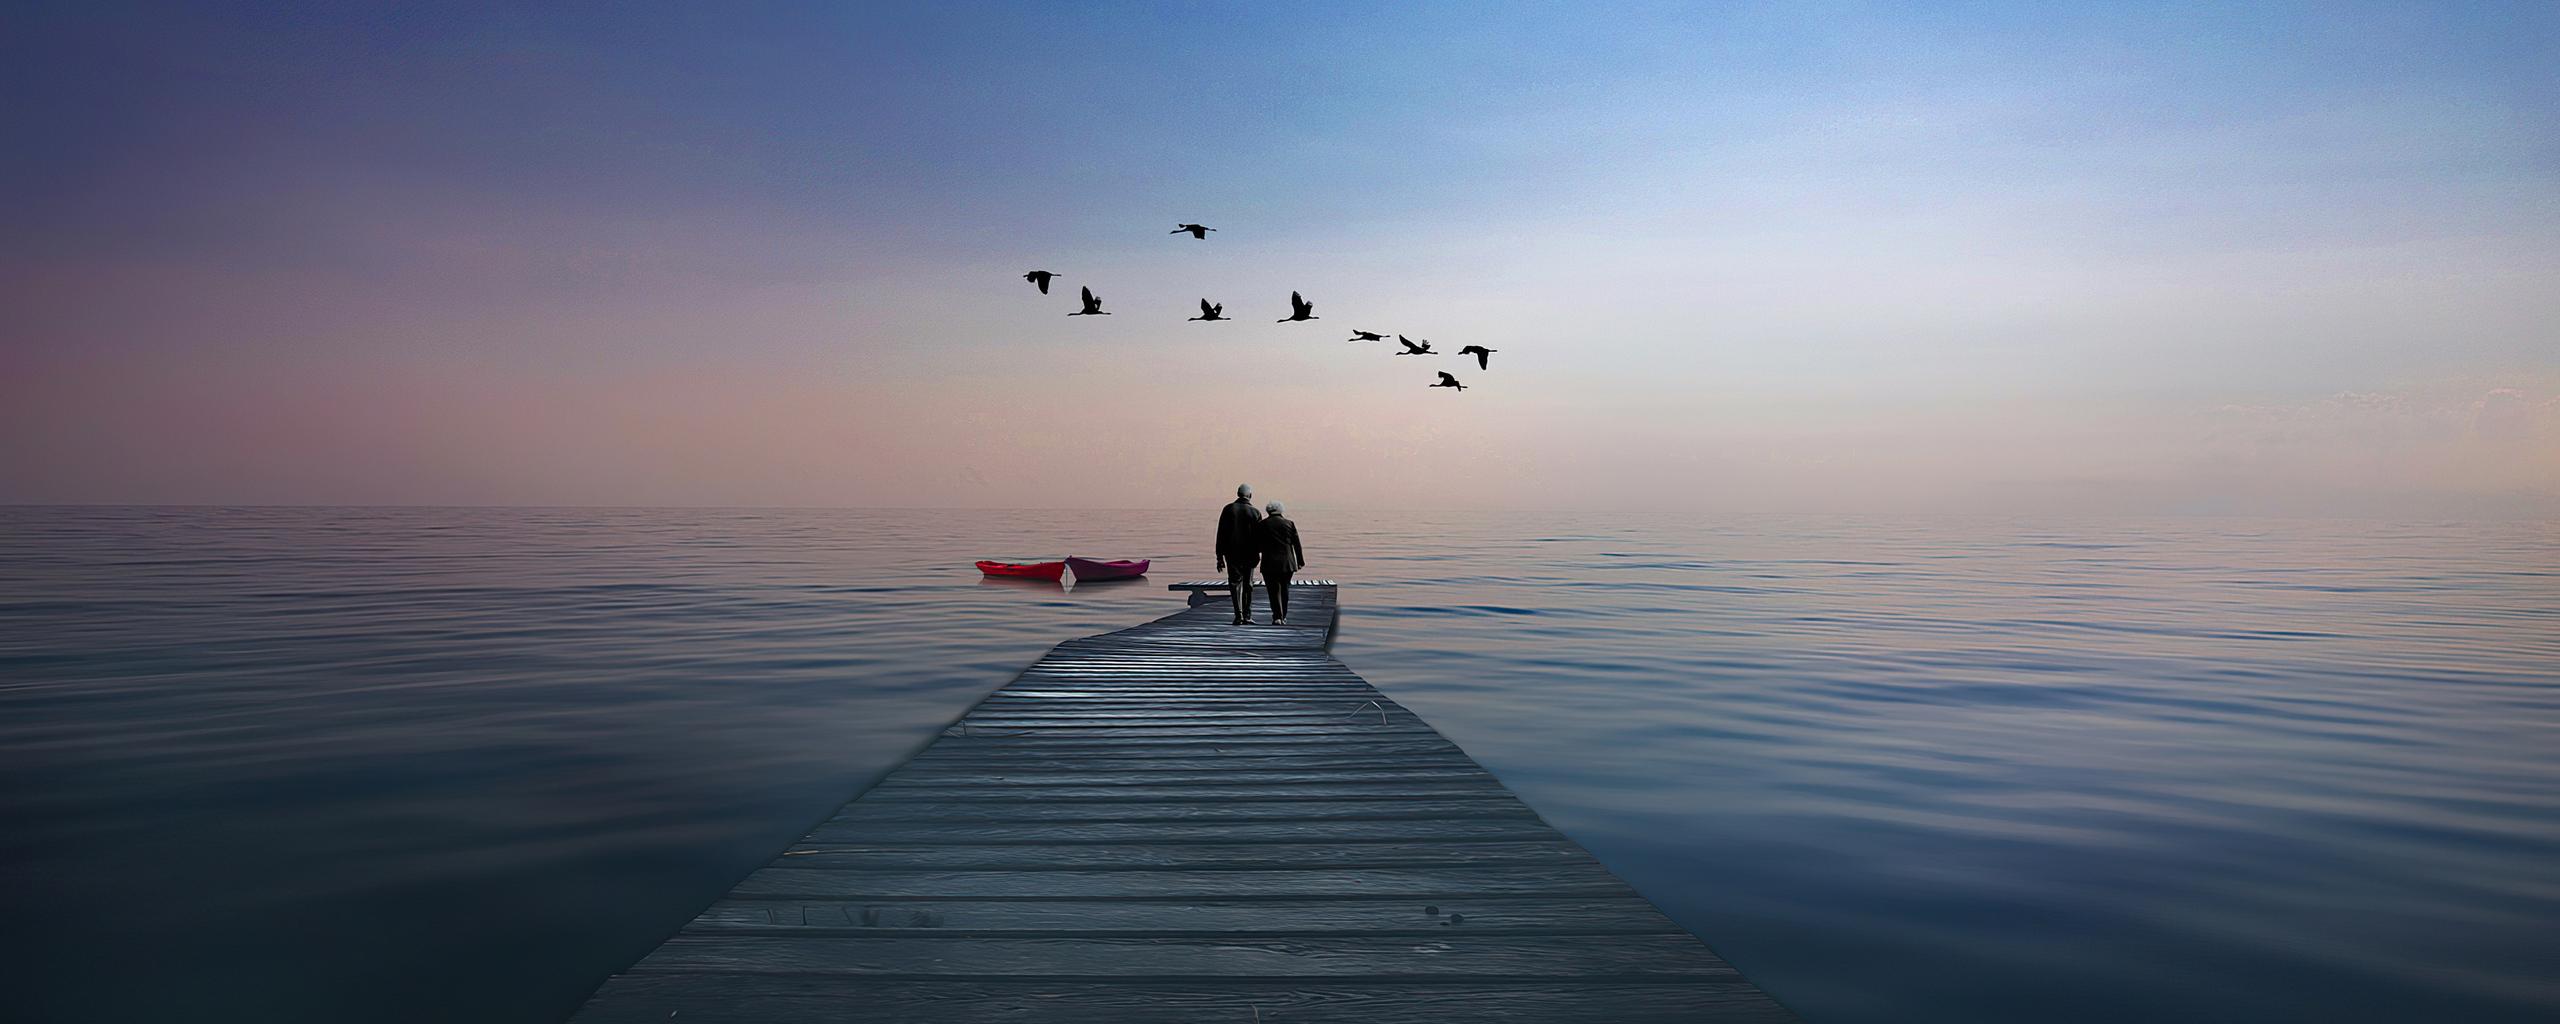 couple-boat-birds-4k-5q.jpg